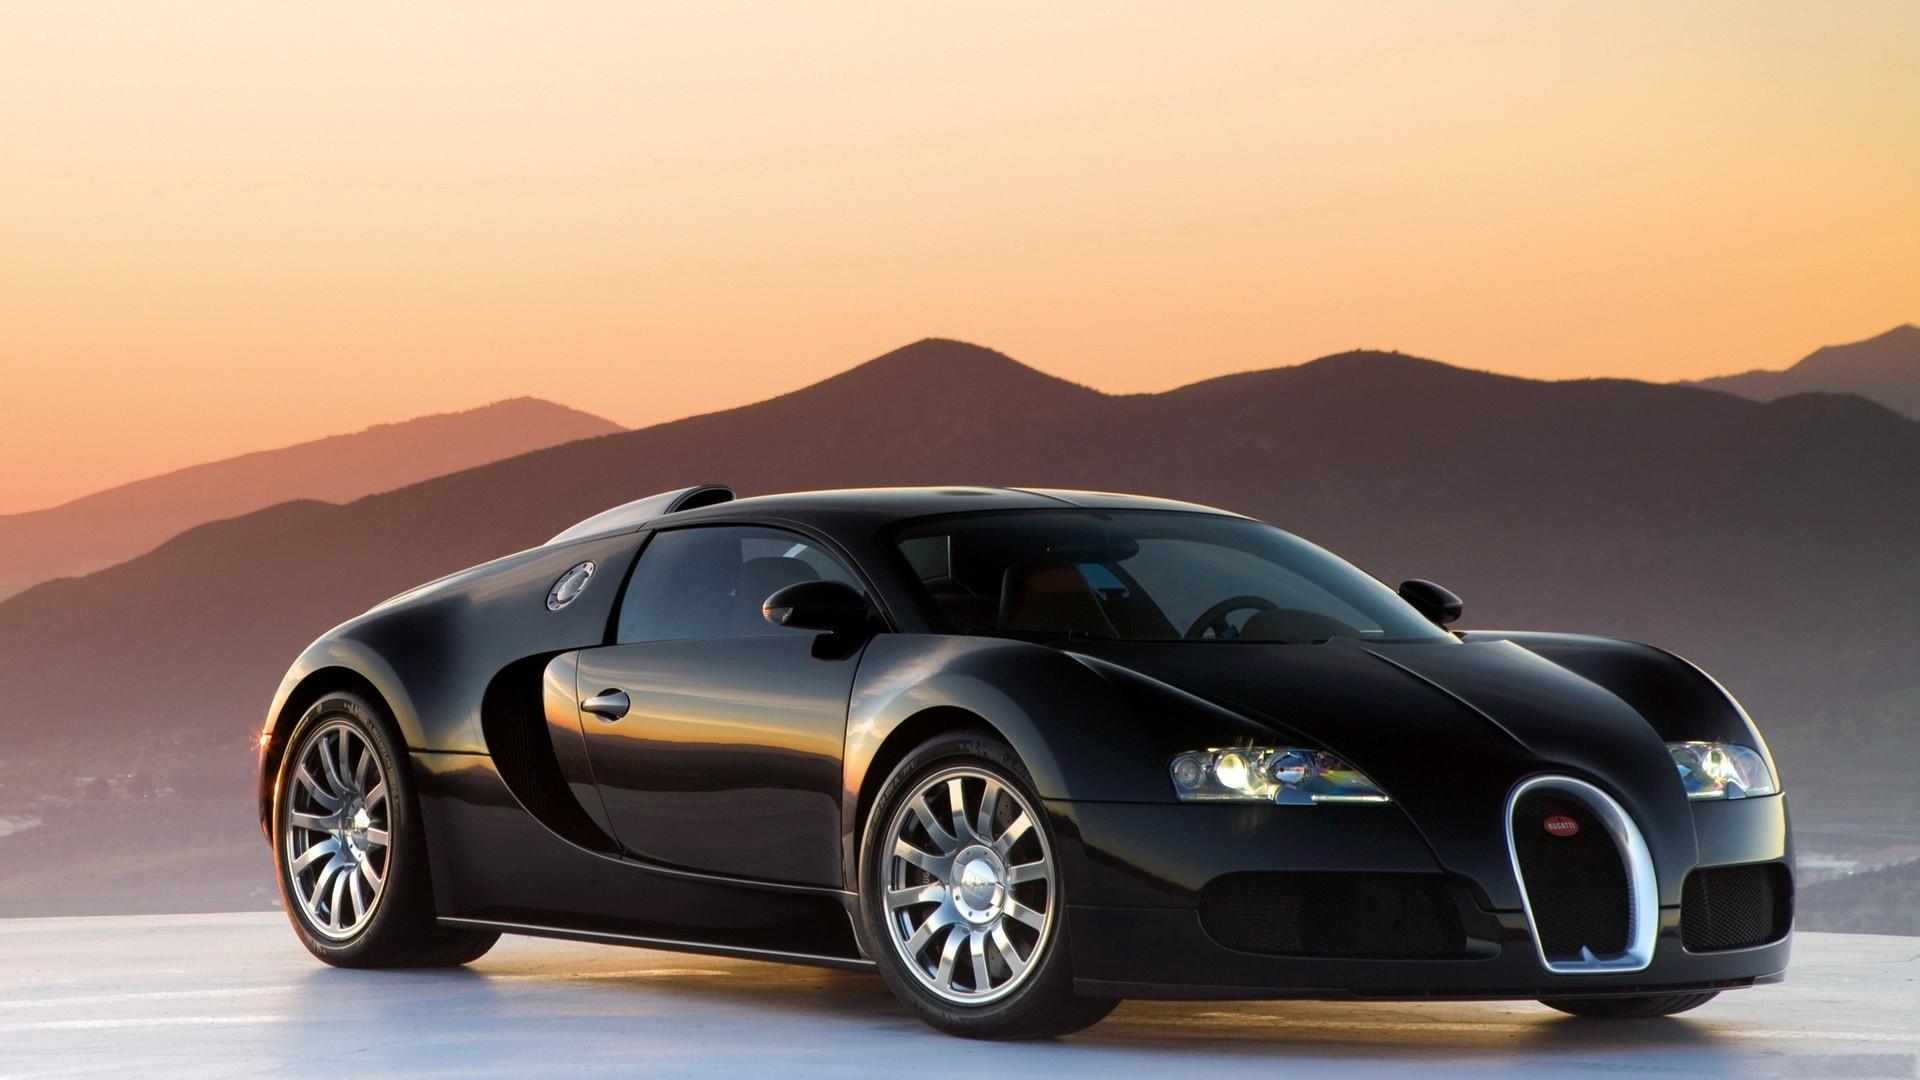 Bugatti Veyron Wallpaper Backgrounds 583 Wallpaper Cool 1920x1080